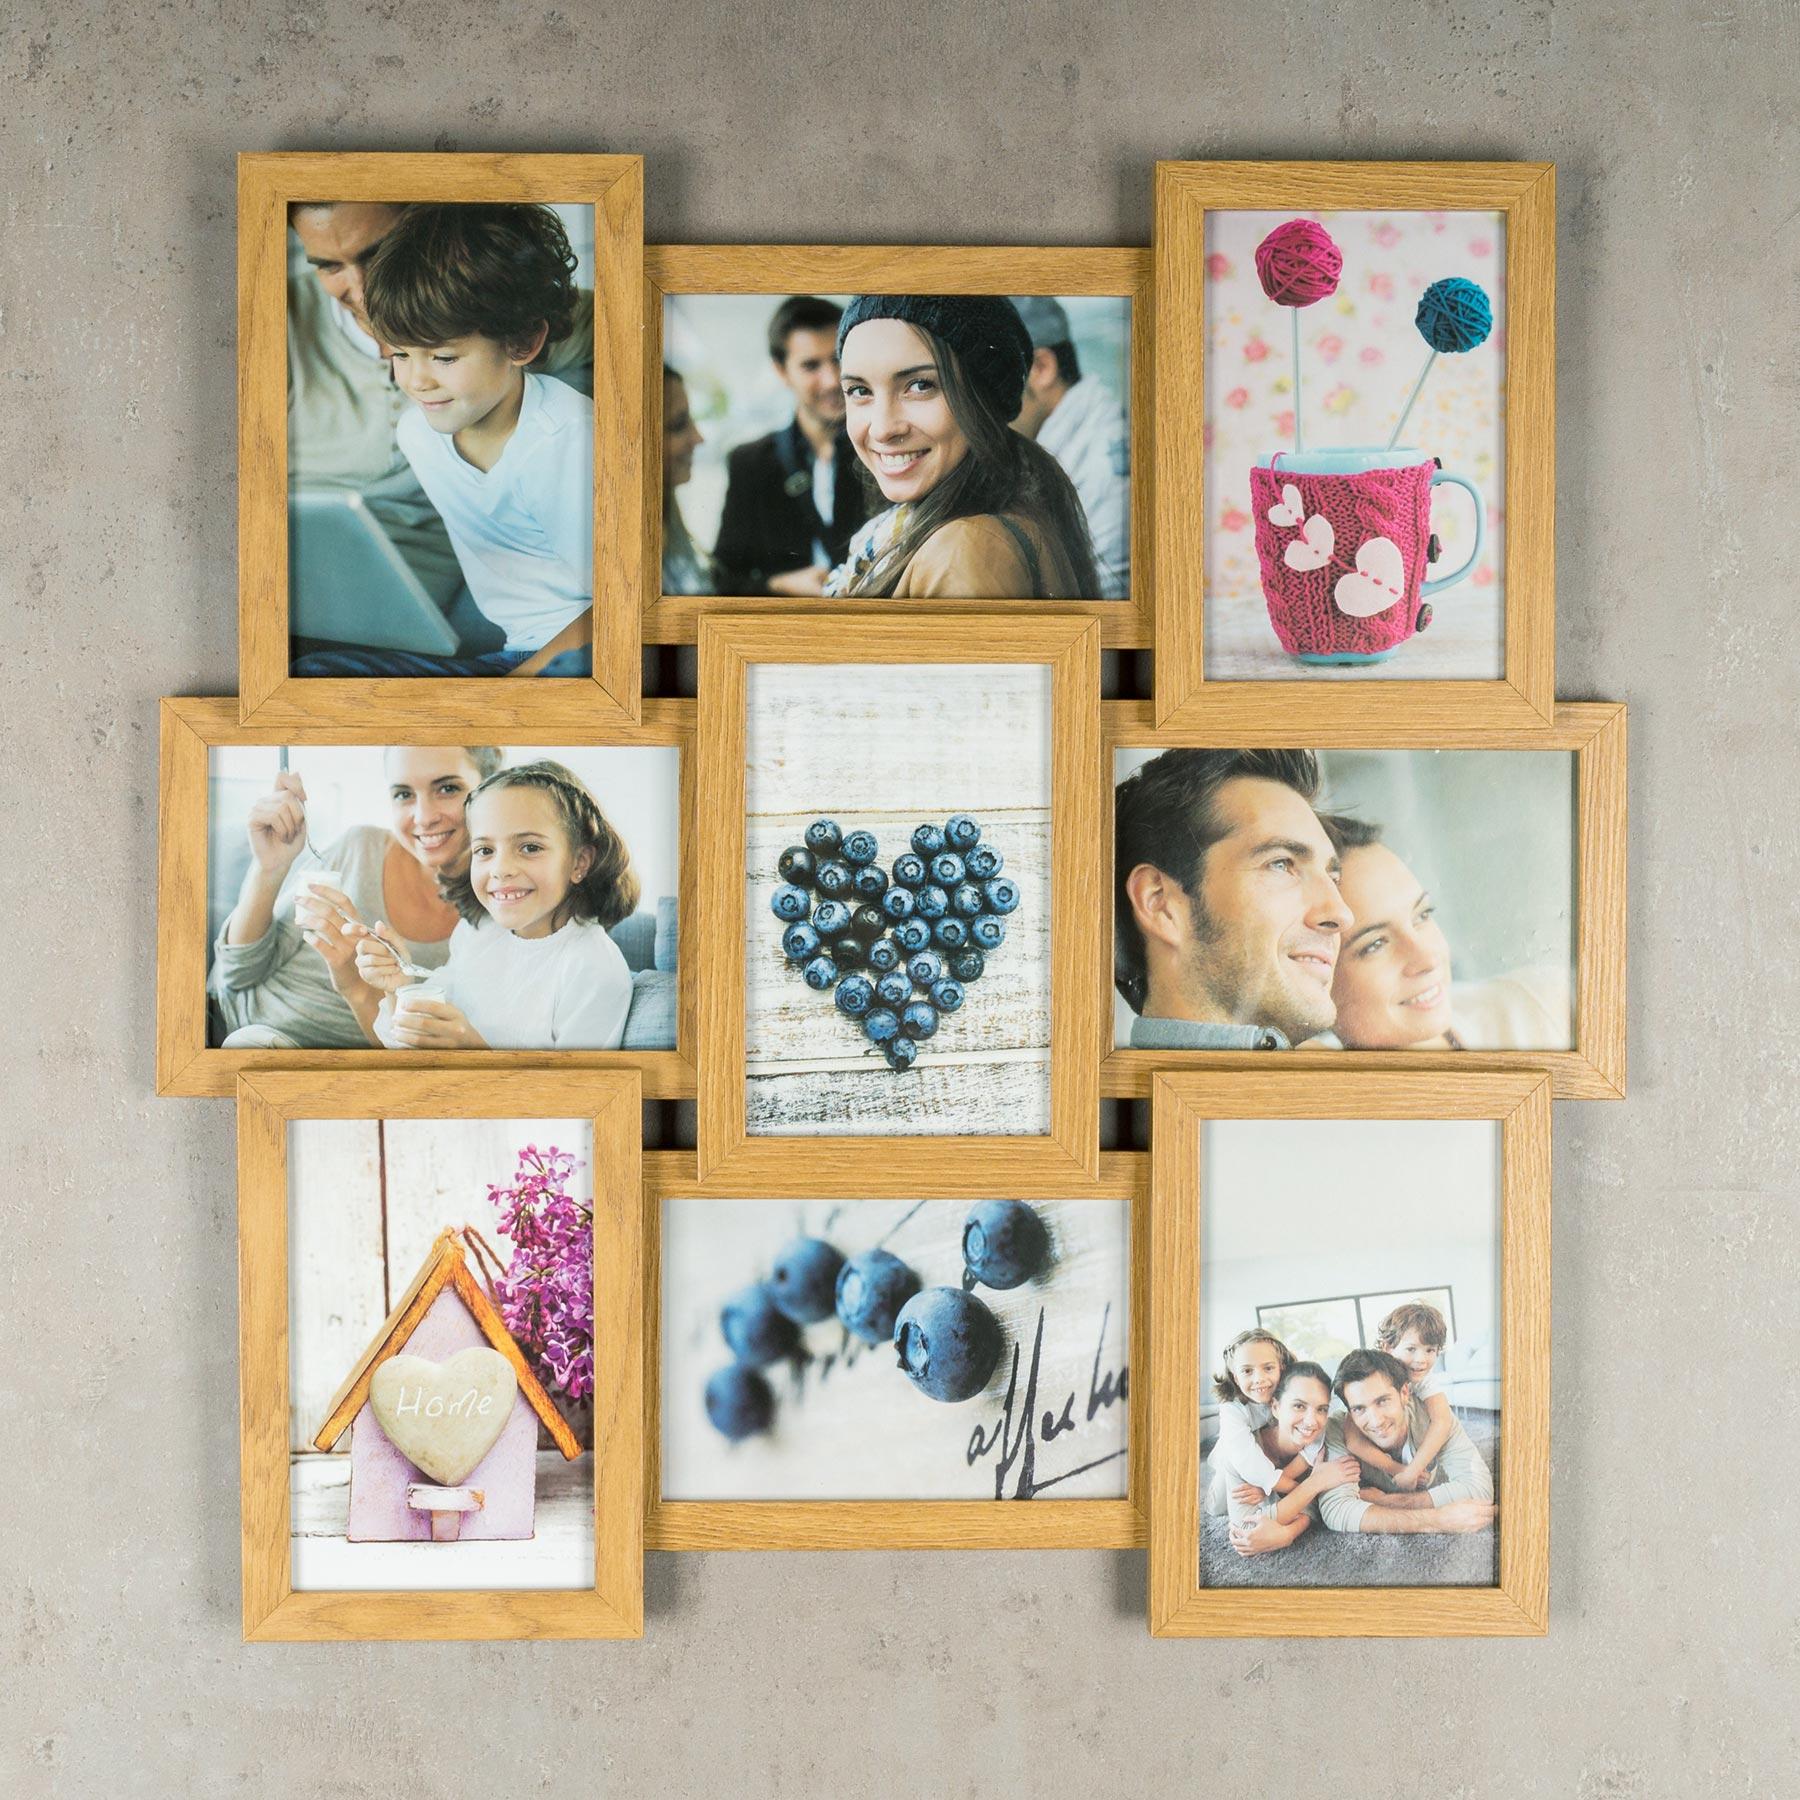 levandeo bilderrahmen collage 45x45cm 9 fotos 10x15 eiche. Black Bedroom Furniture Sets. Home Design Ideas